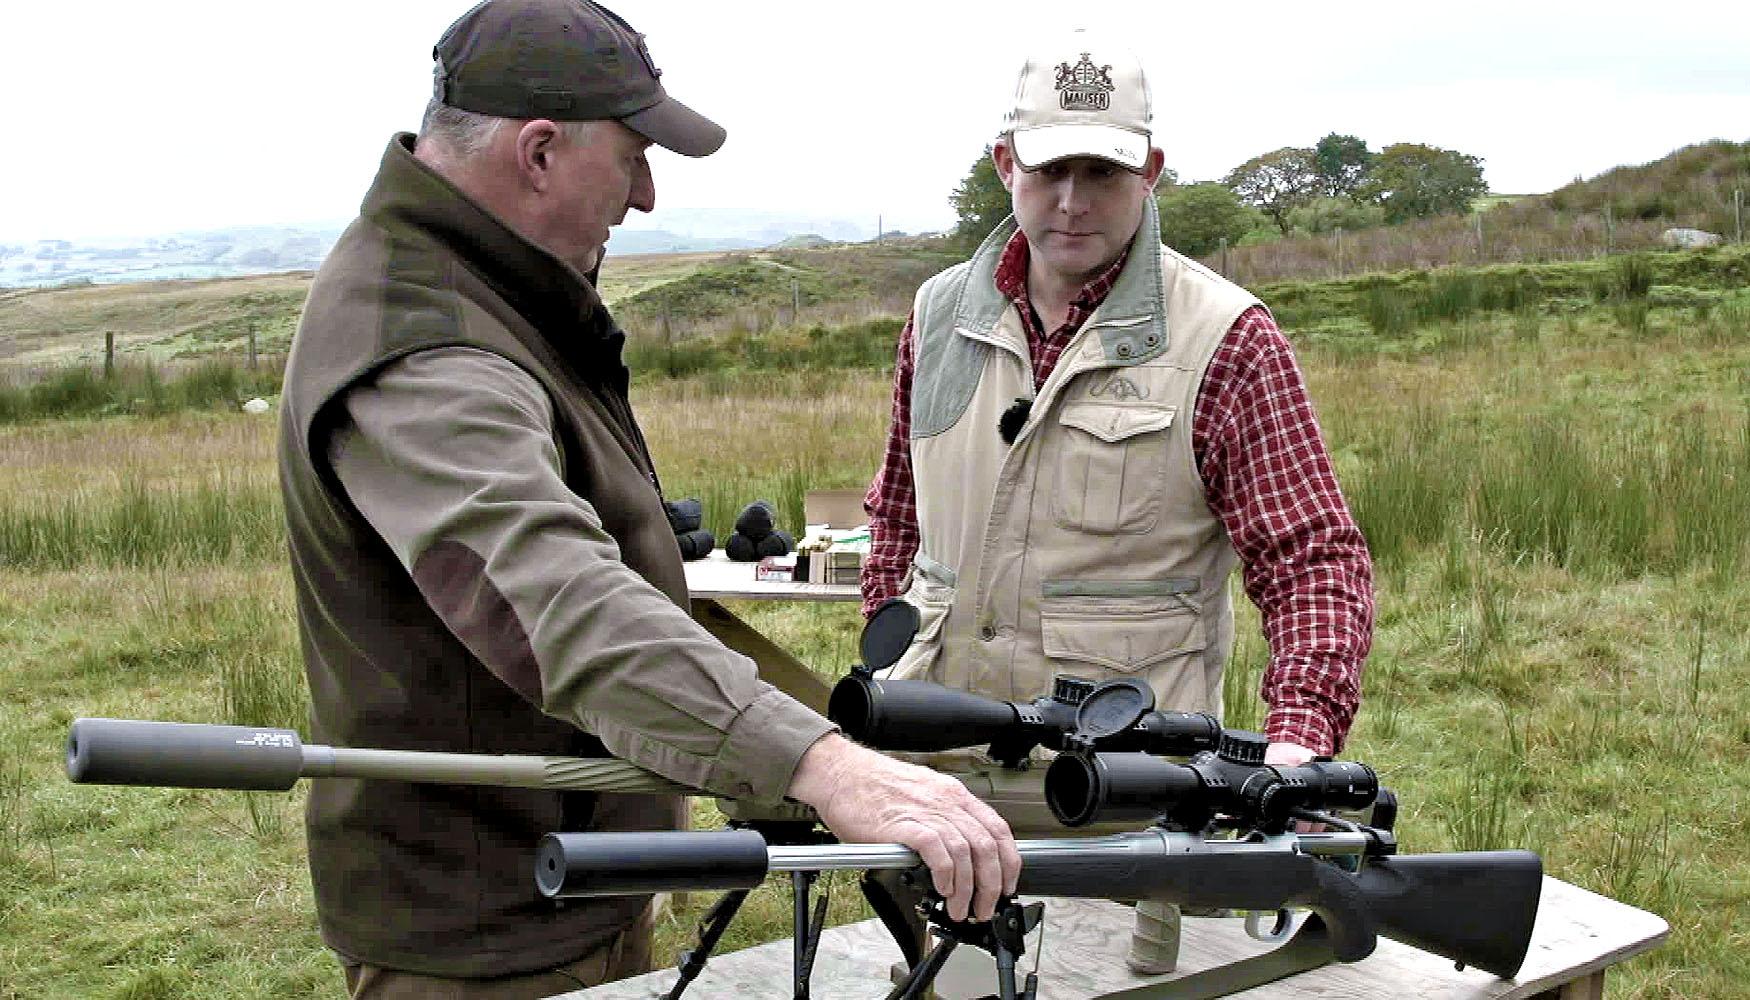 VIDEO: Mauser M12 Impact rifle in the field | GUNSweek com